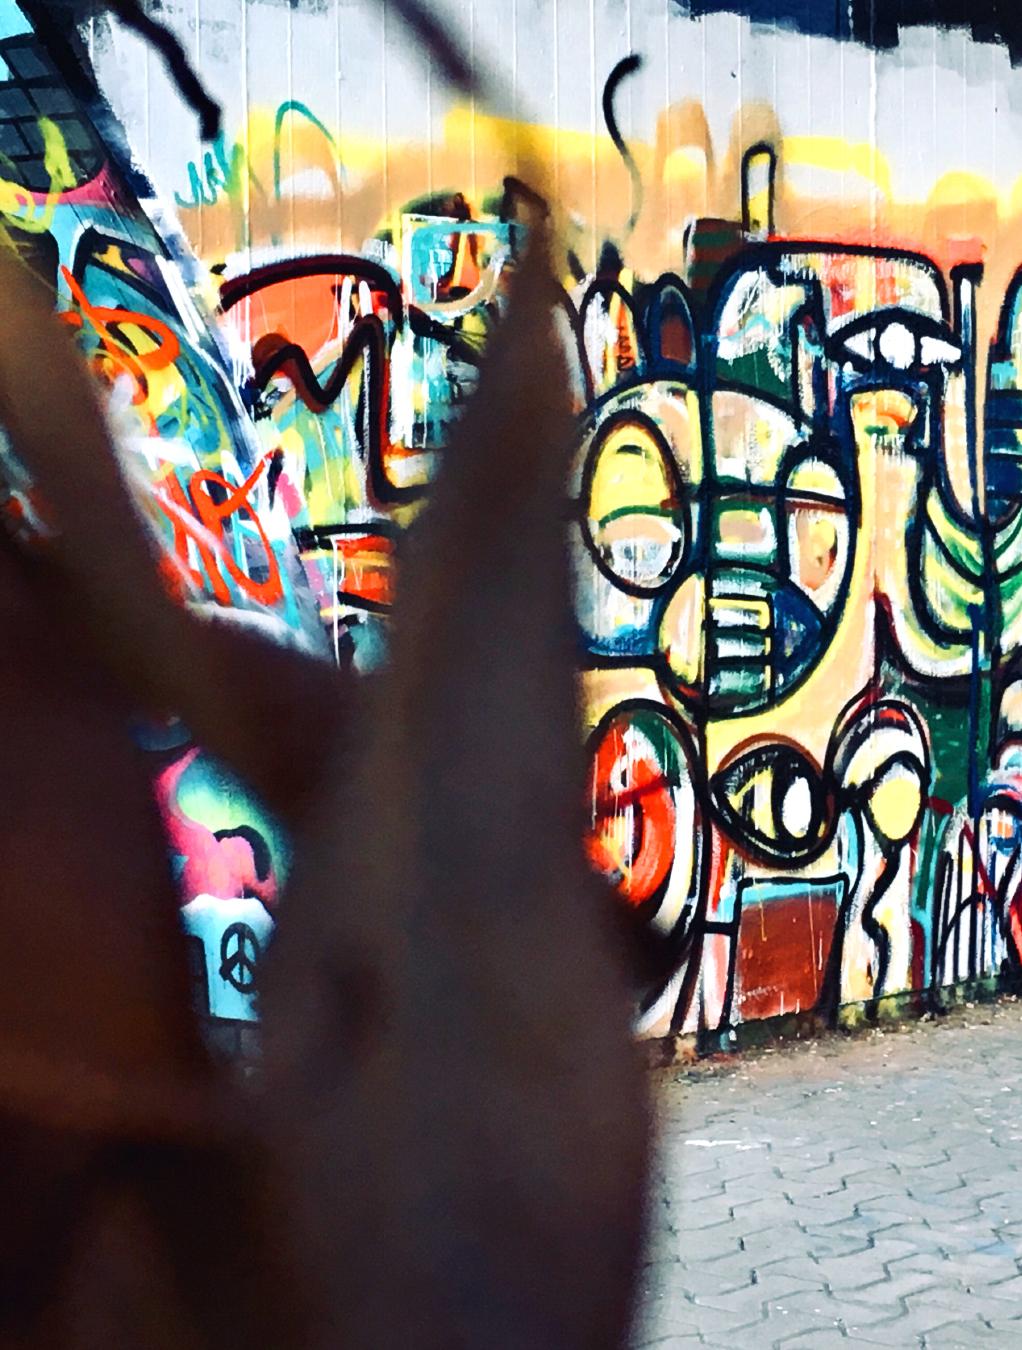 Rob_Adalierd_Painting_Vienna_Abstract_Contemporary_Street_art_thumb.jpg